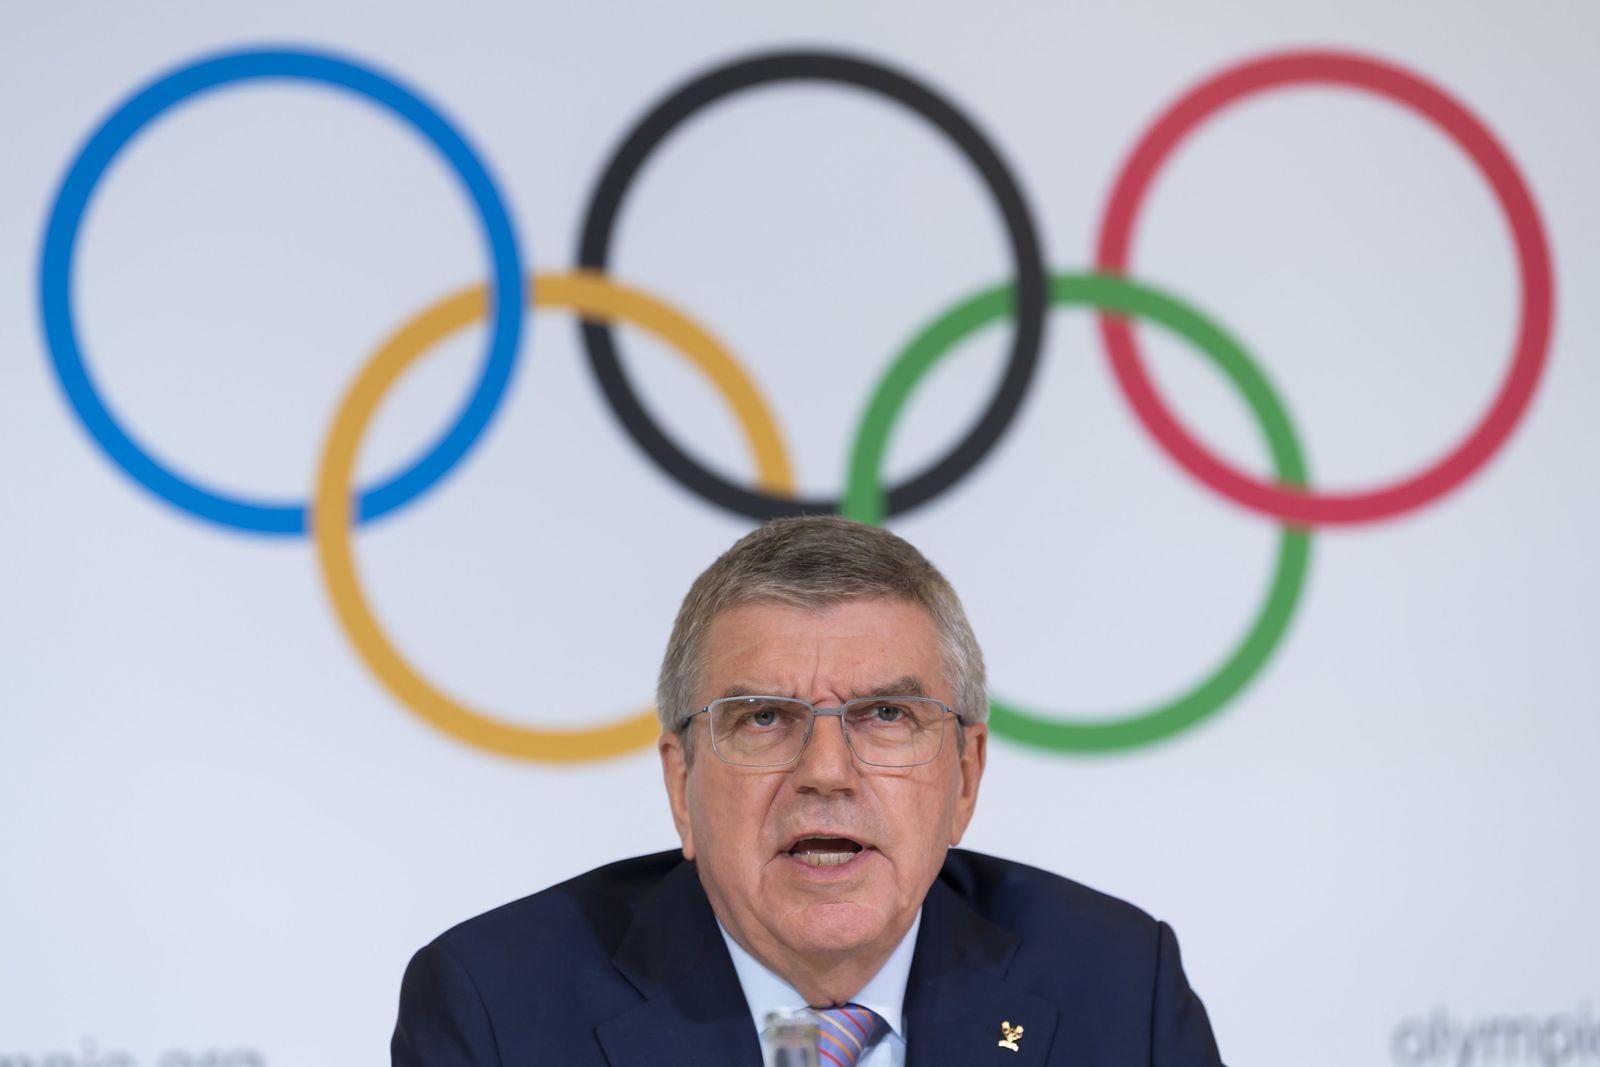 Sitzung des IOC-Exekutivkomitees